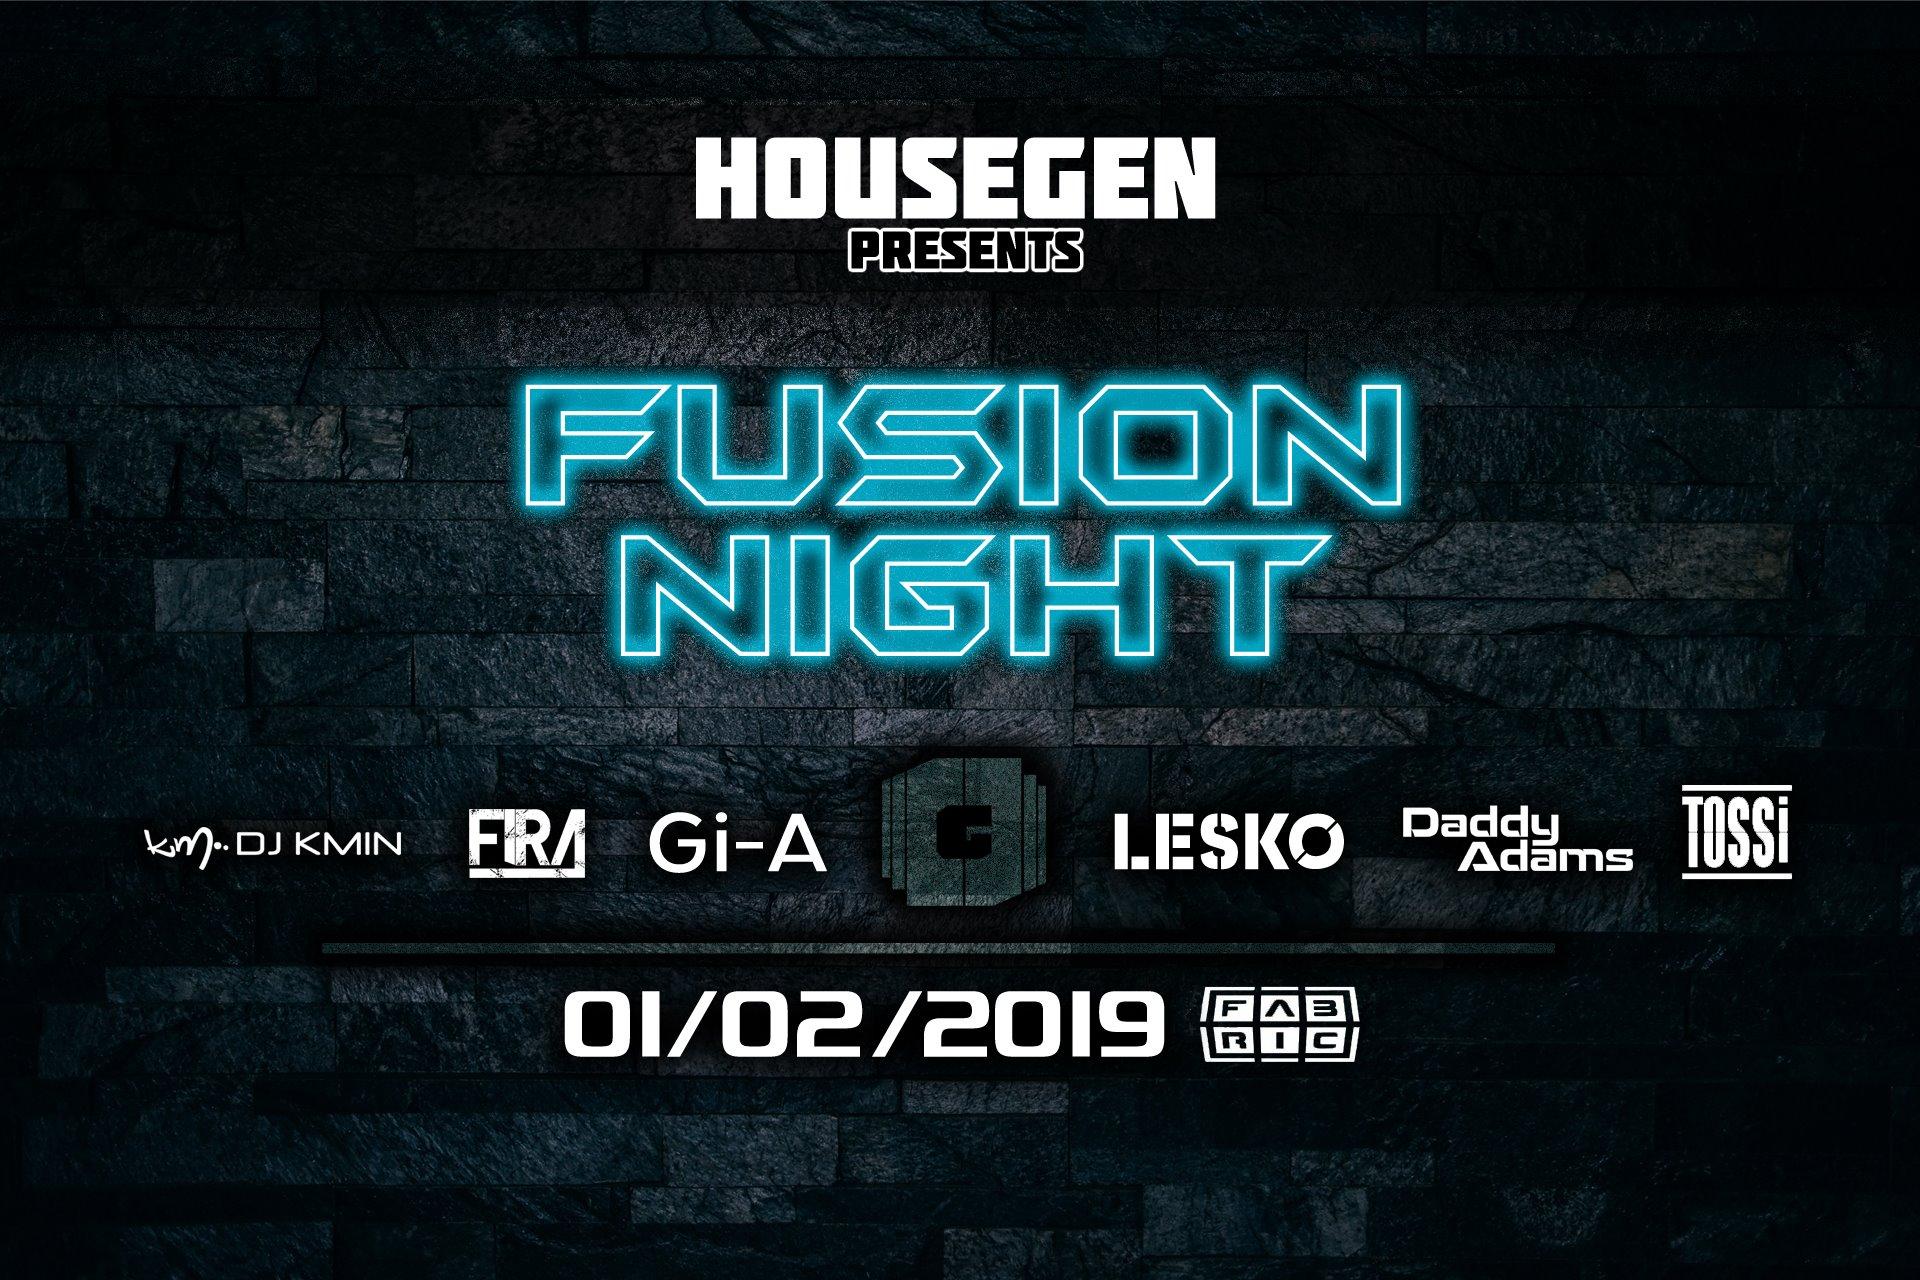 HouseGen: Fusion NIght